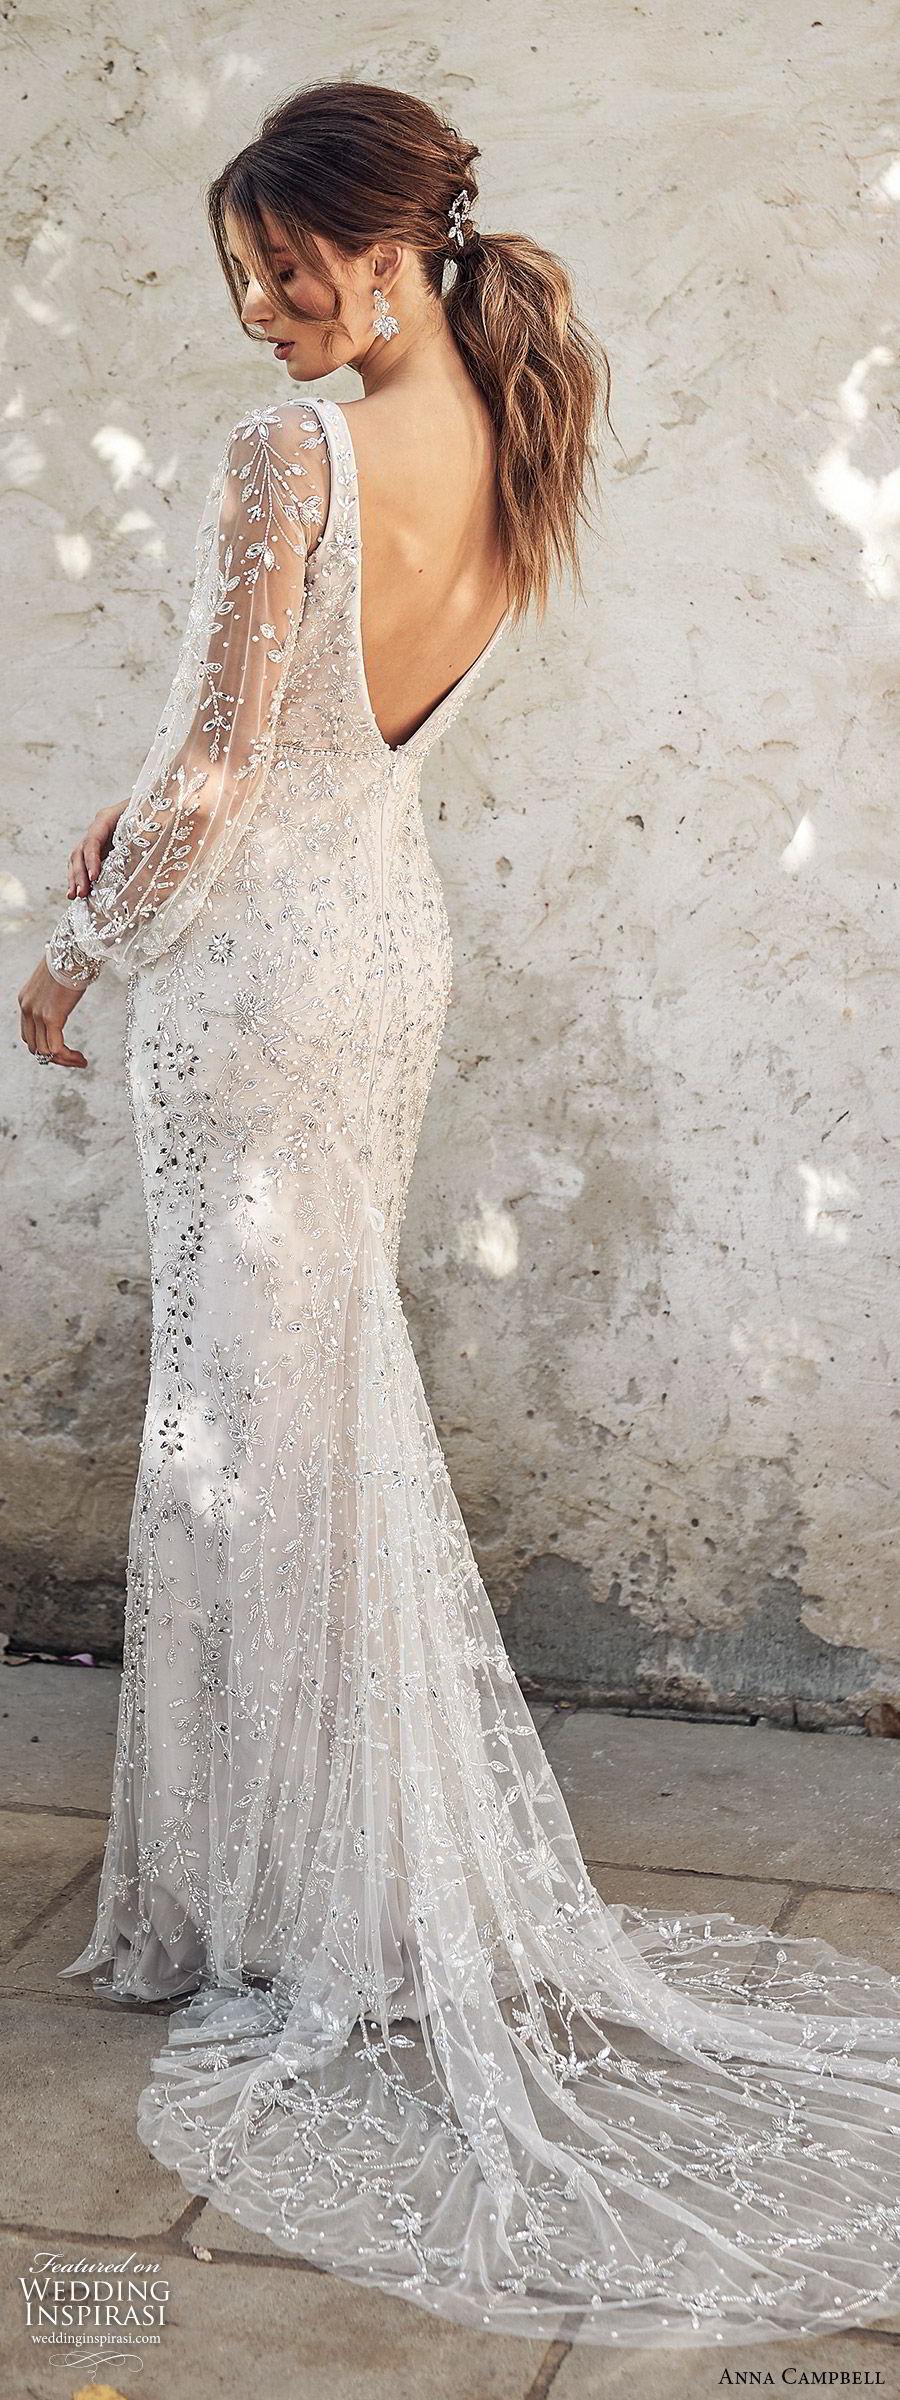 anna campbell 2020 bridal illusion bishop sleeves v neckline fully embellished trumpet mermaid sheath wedding dress (1) glam elegant glitzy scoop back chapel train bv